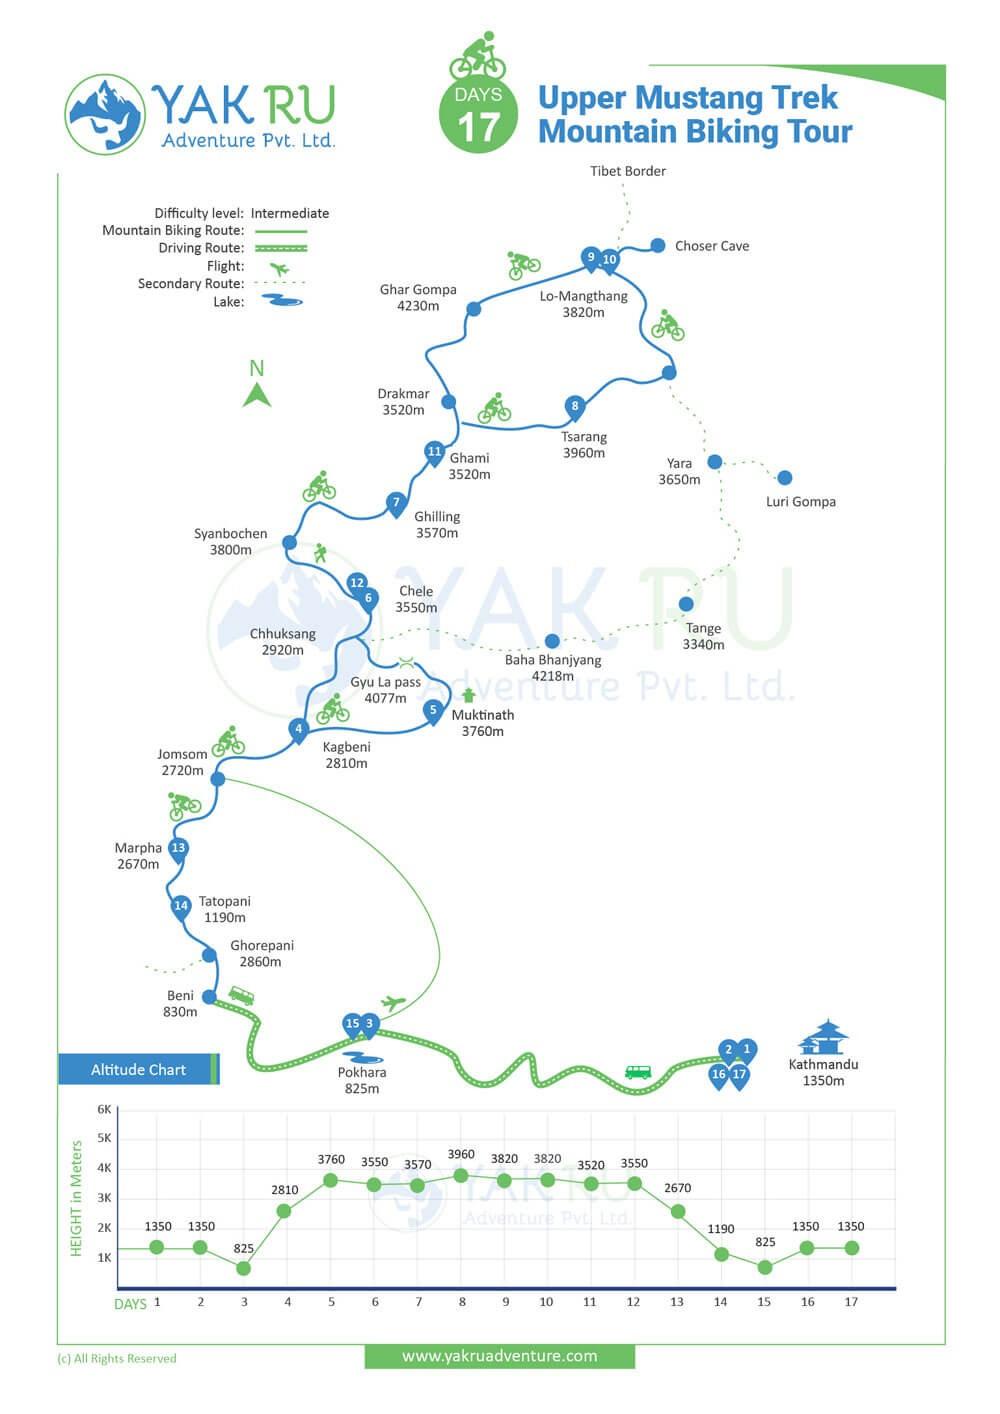 Upper Mustang Mountain Biking Tour map